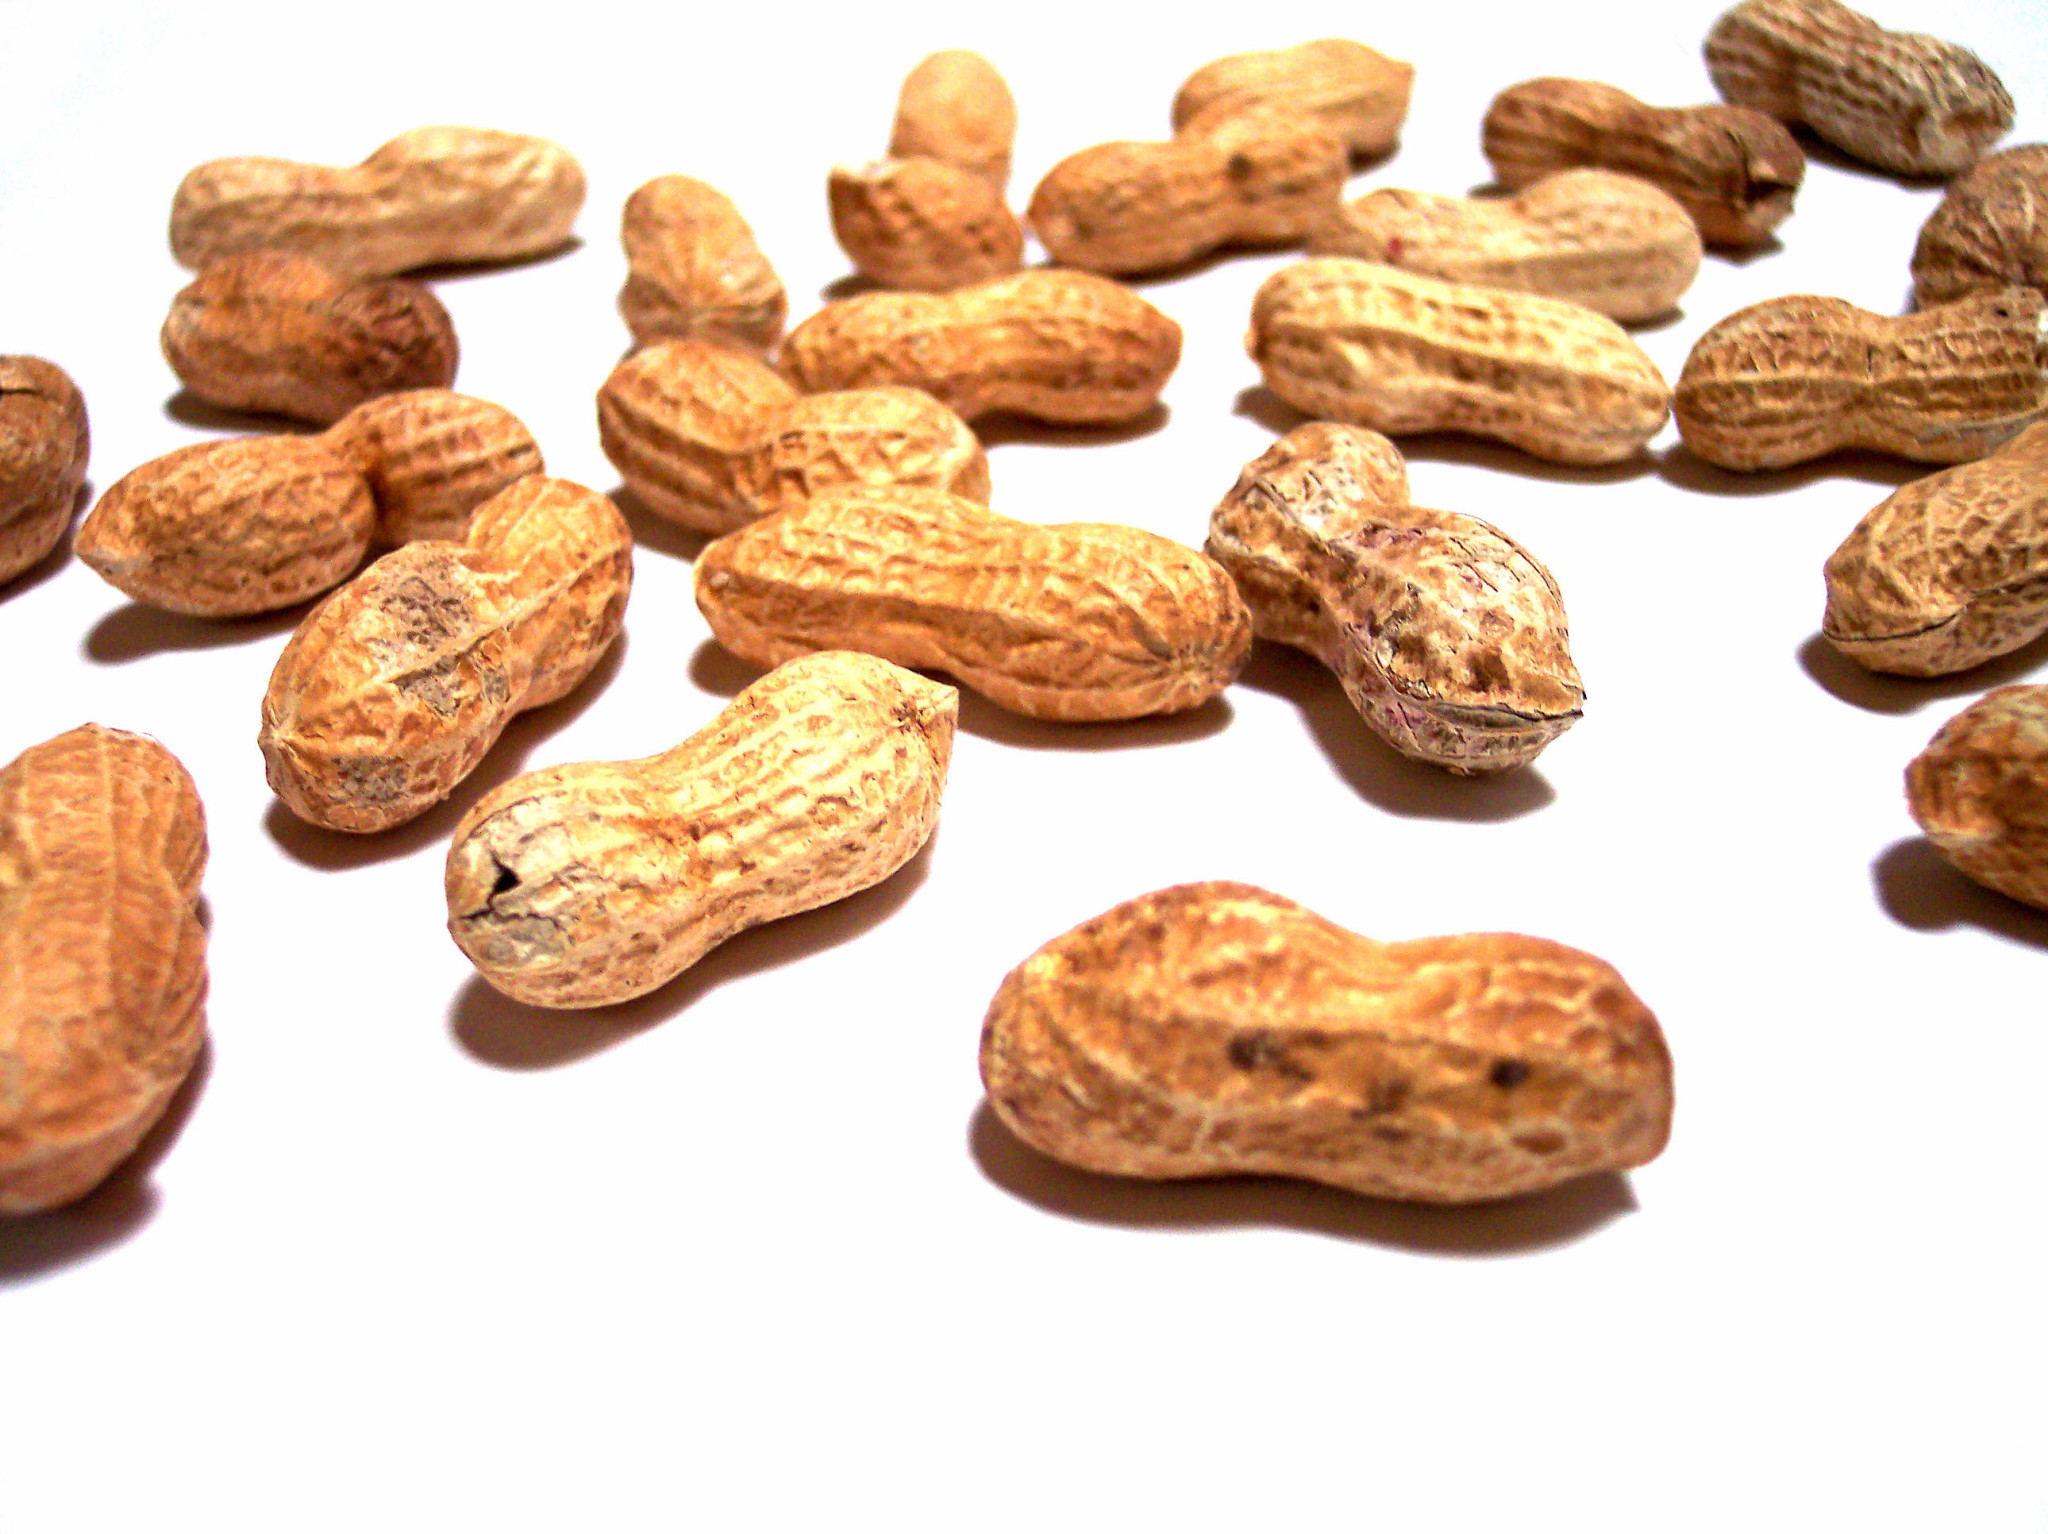 705637_com_nuts-1